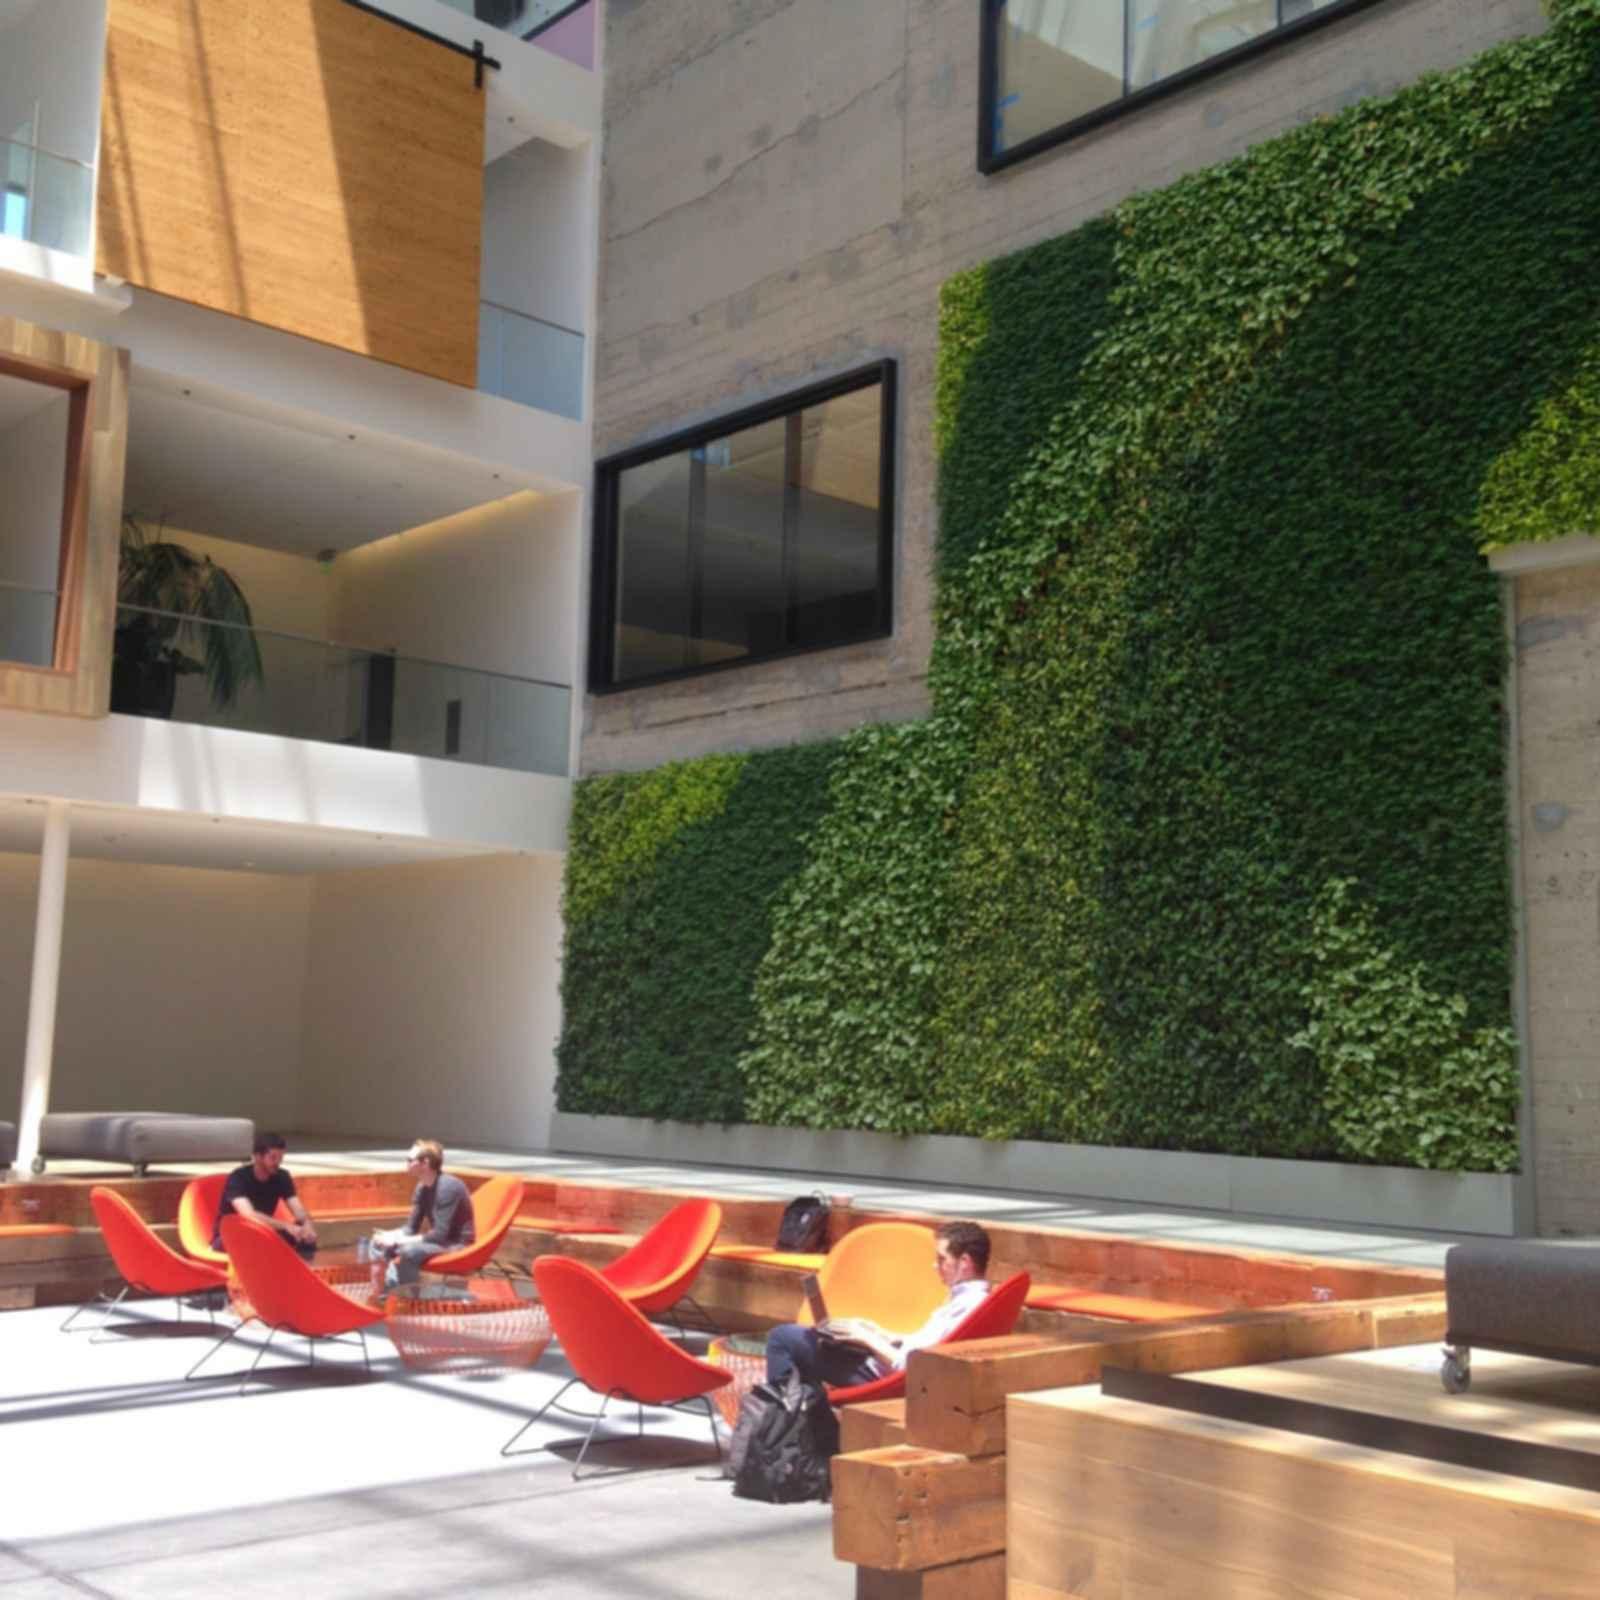 Airbnb Headquarters - Outdoor Area